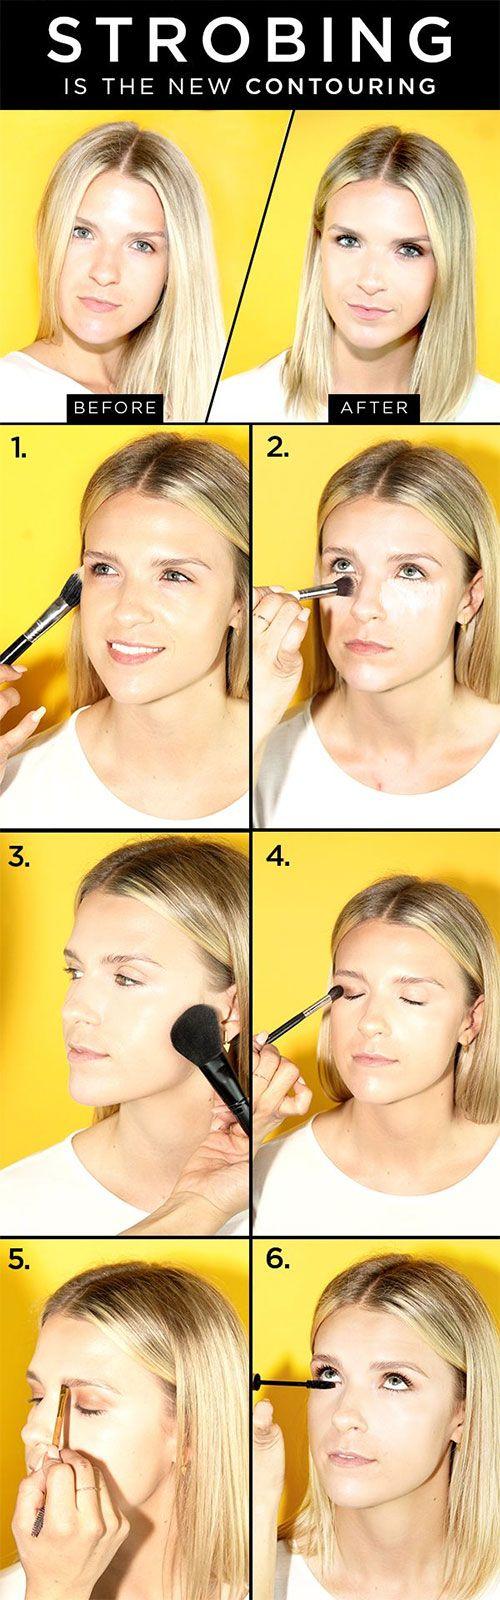 source make your skin glow makeup tips 11 easy strobing hacks tips that  39 ll make. Makeup Tips To Make Your Face Glow   Makeup Vidalondon